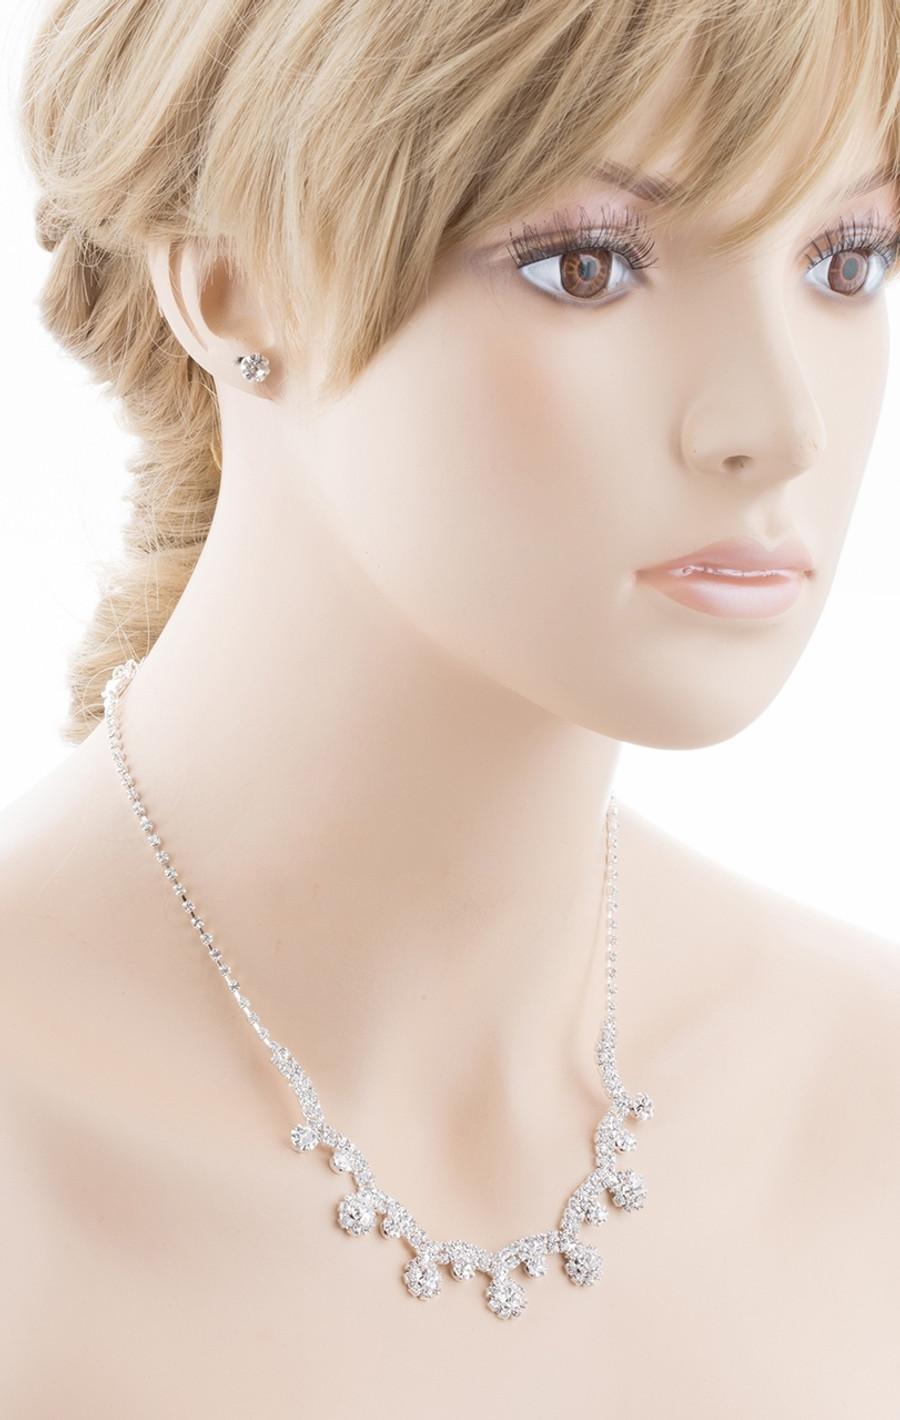 Bridal Wedding Jewelry Crystal Rhinestone Prom Necklace Earrings Set J727 Silver